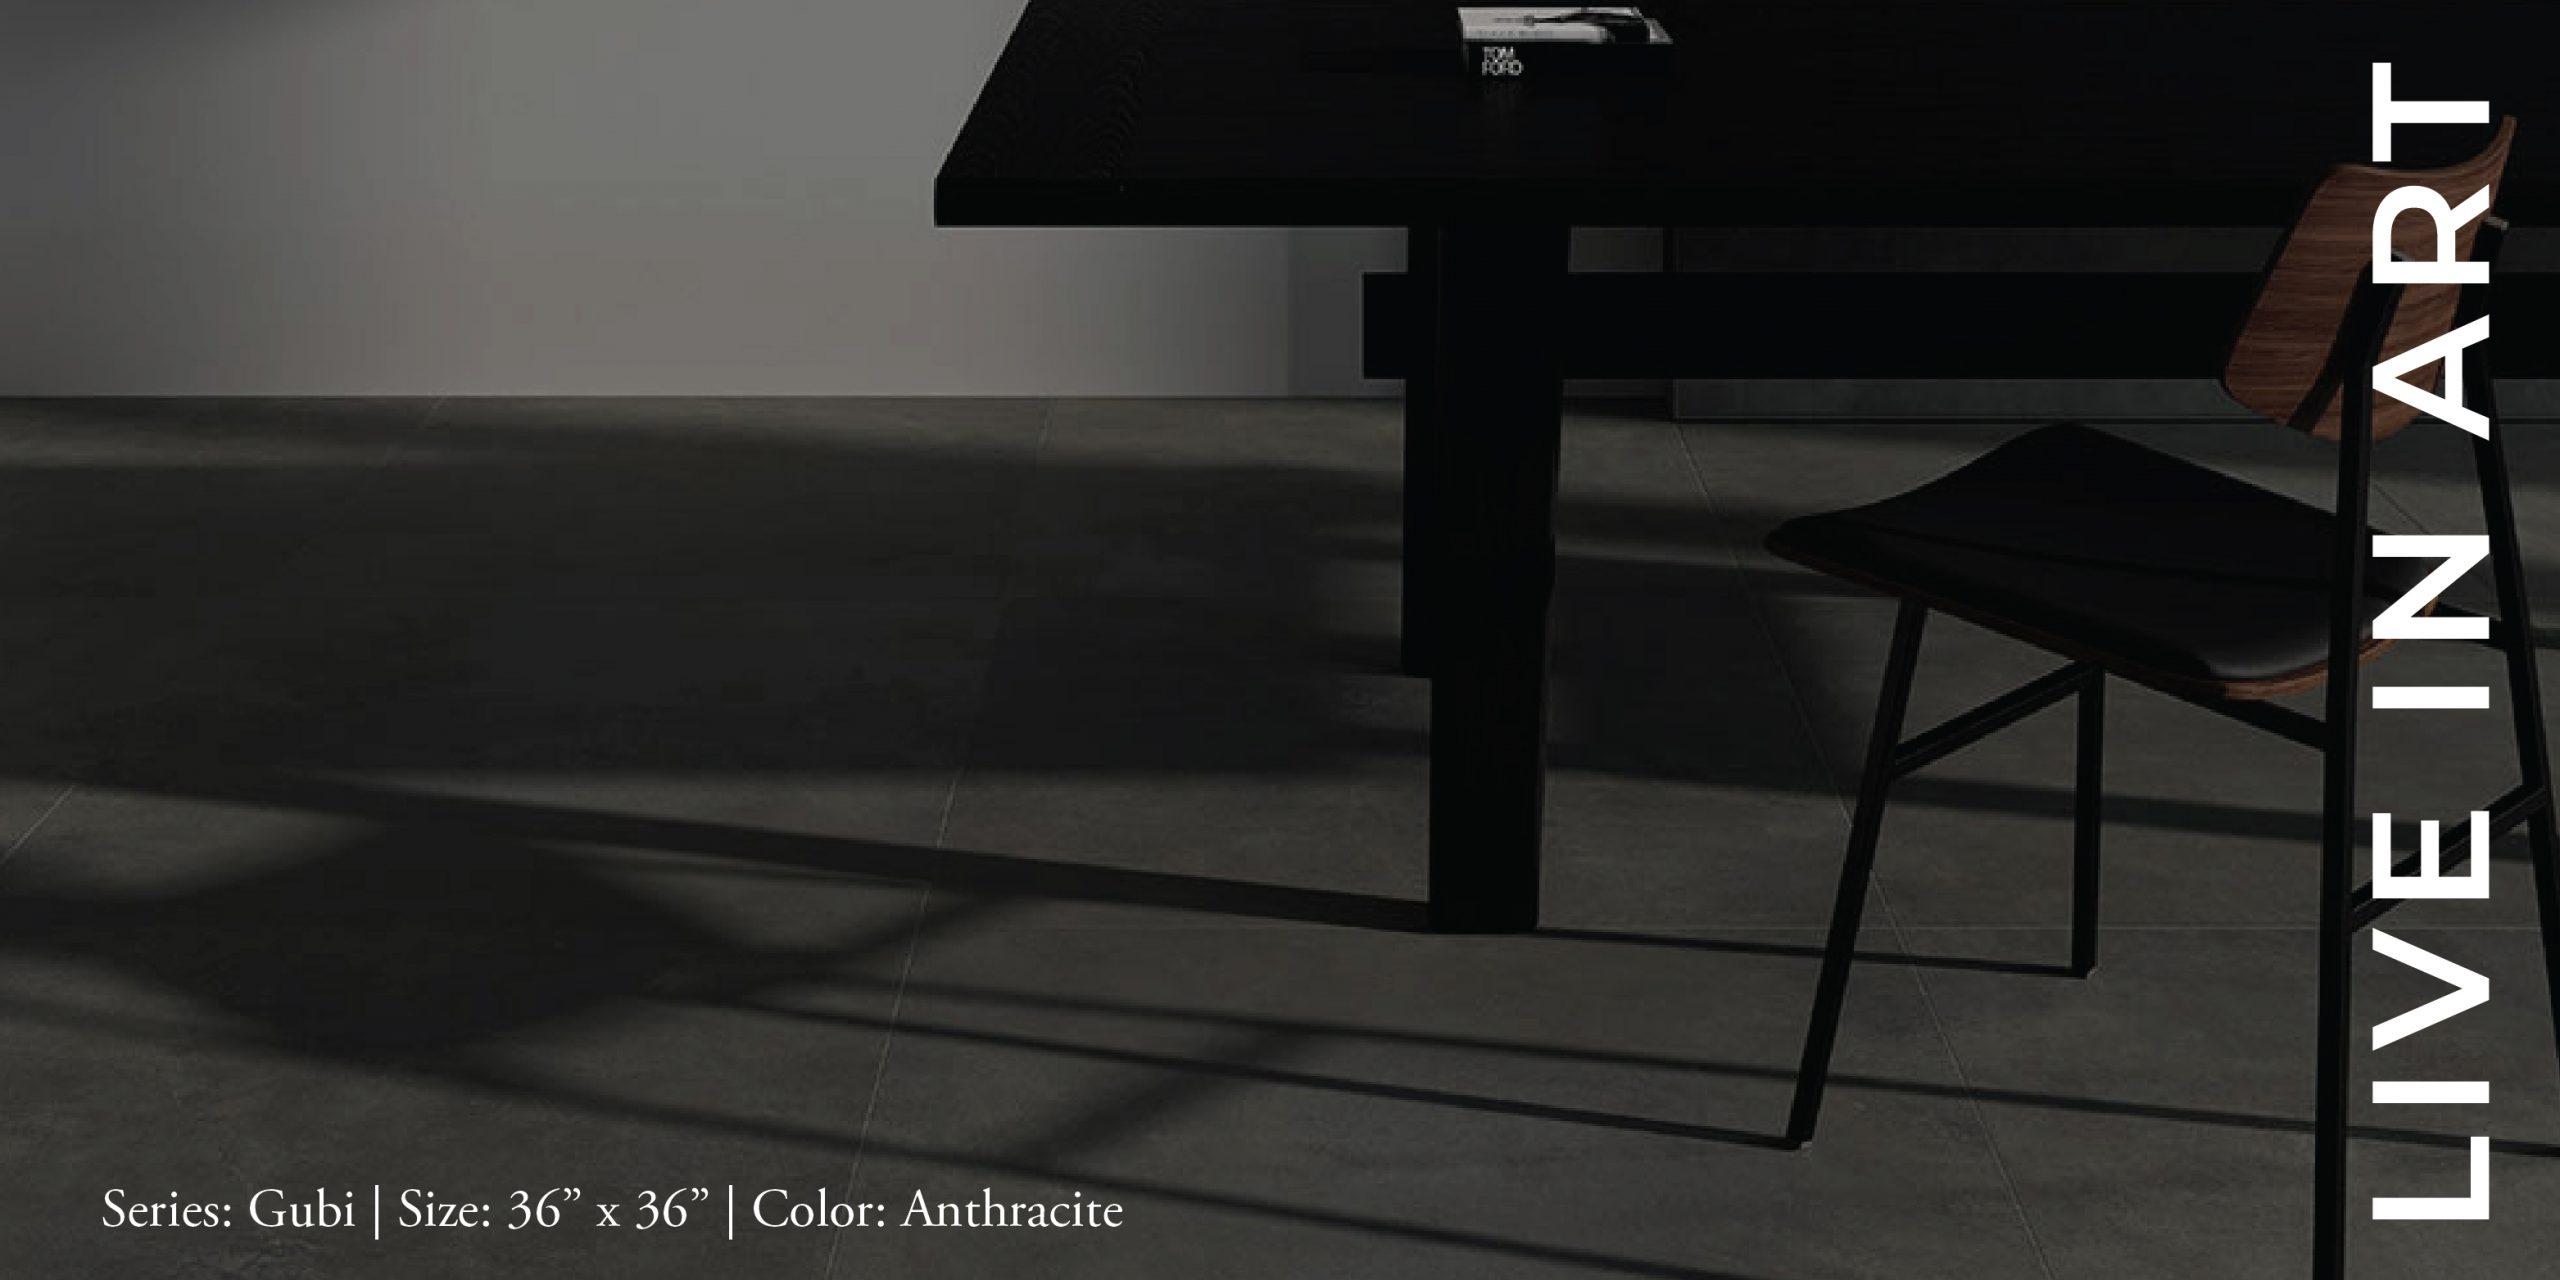 Gubi Anthracite 36x36-01-01-01